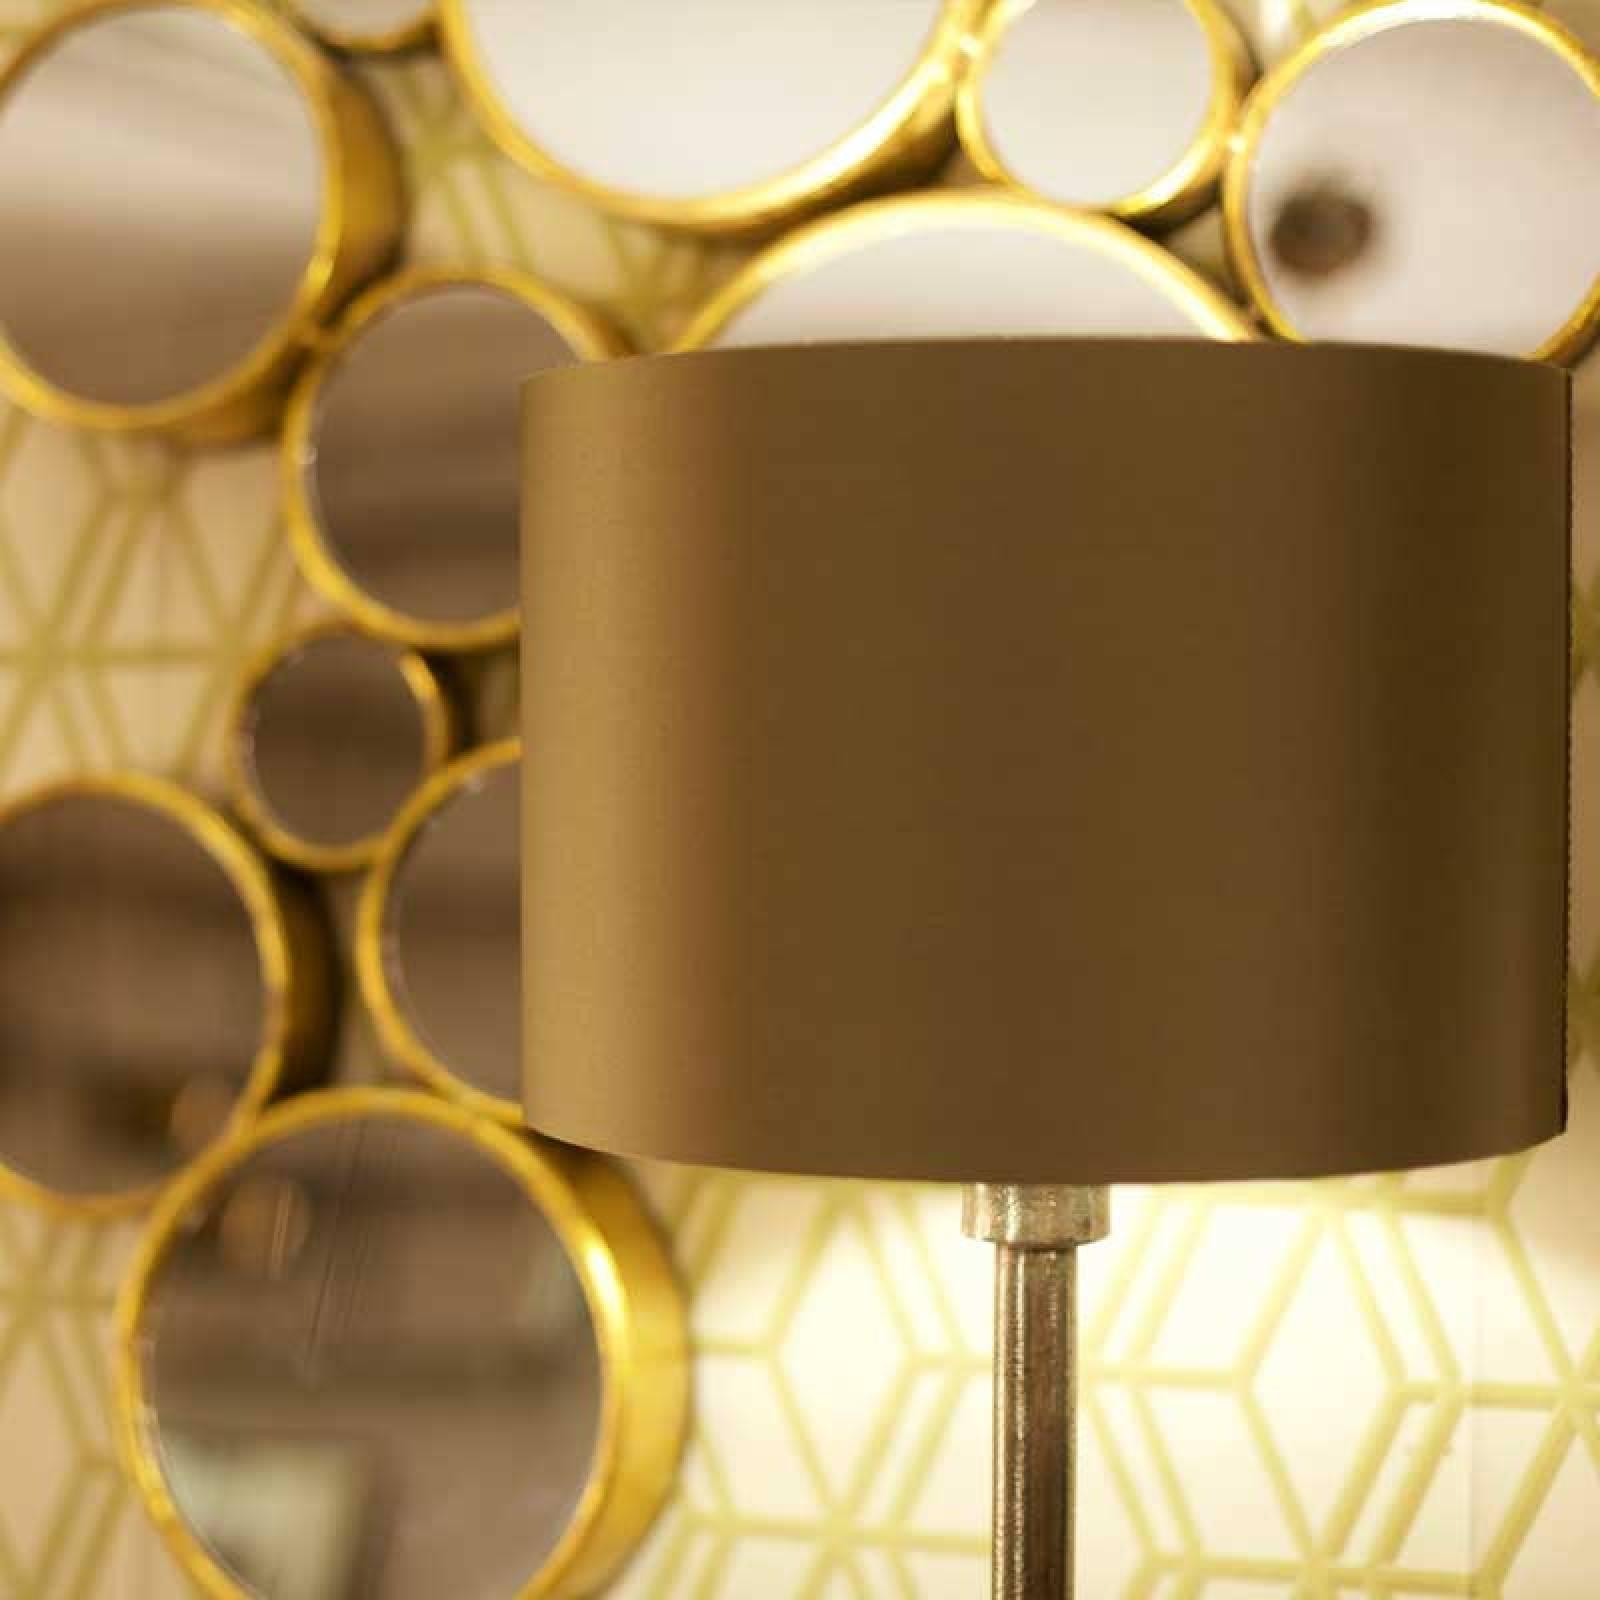 Novi Table Lamp With Croc Print Green Shade thumbnails